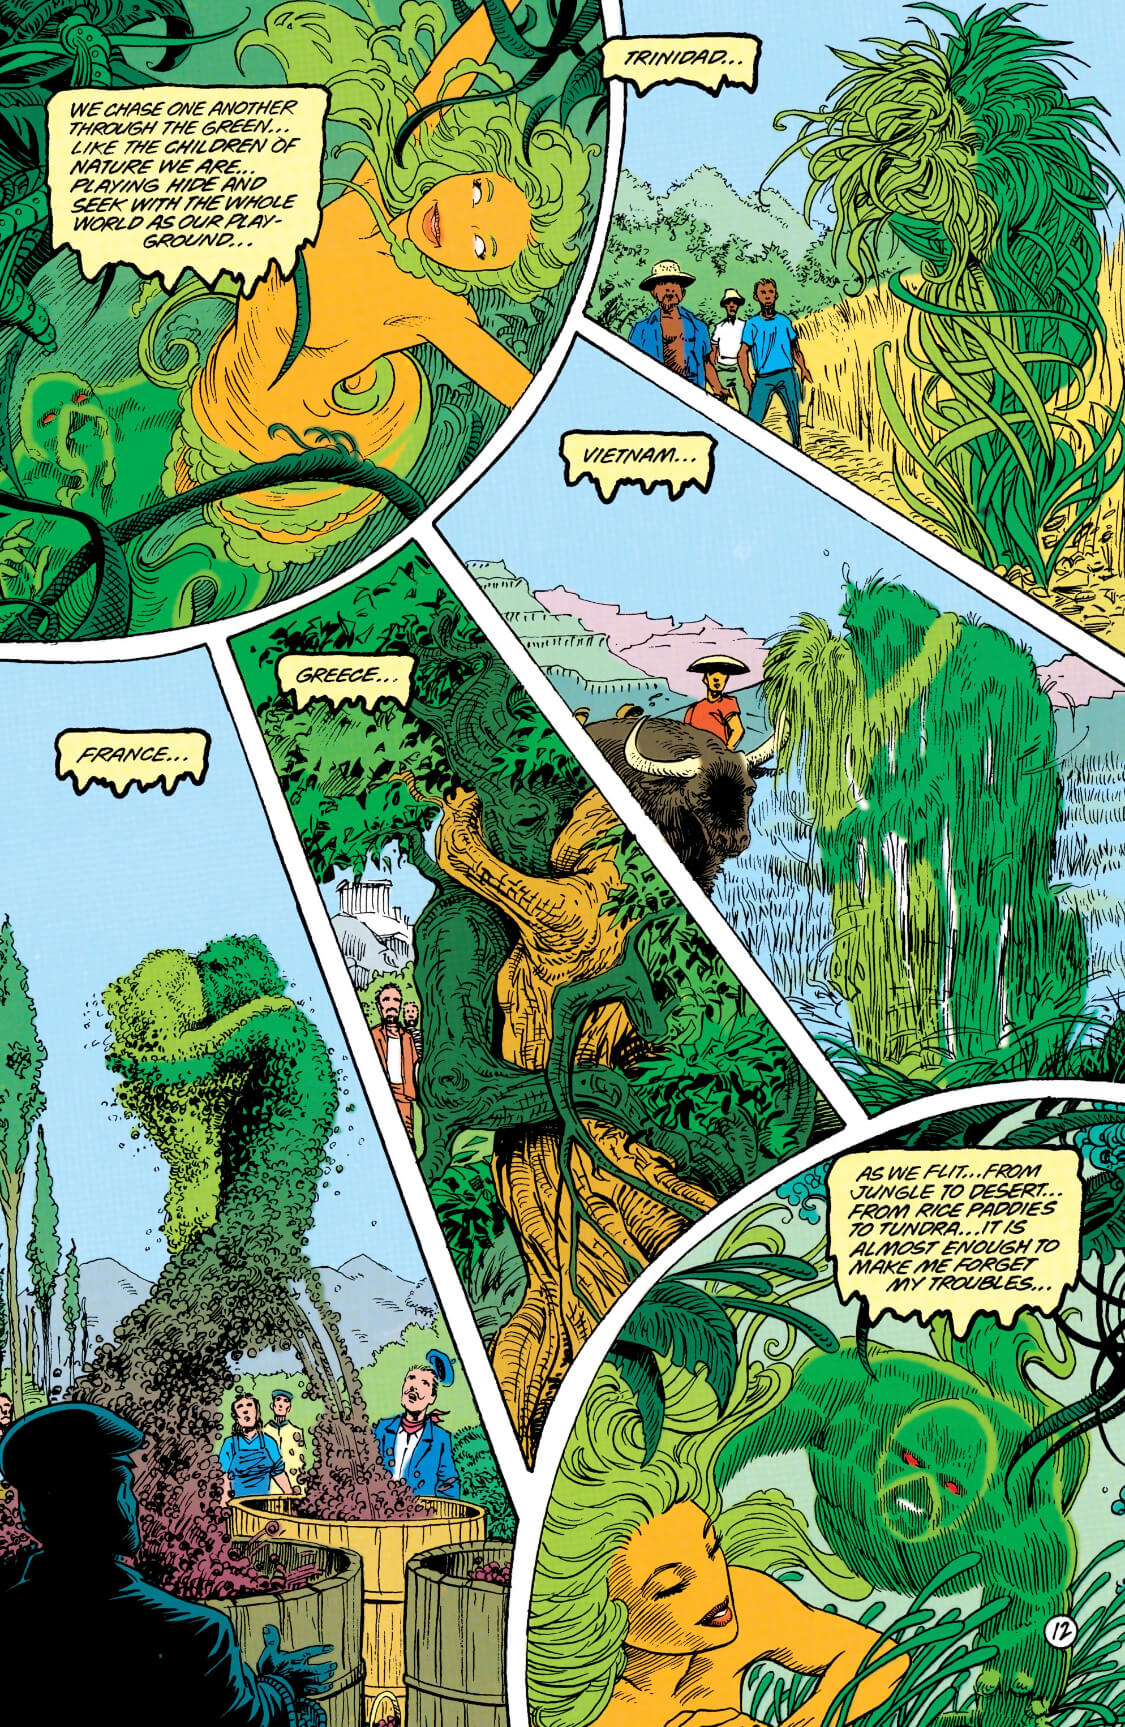 swamp-thing-lady-jane.jpg